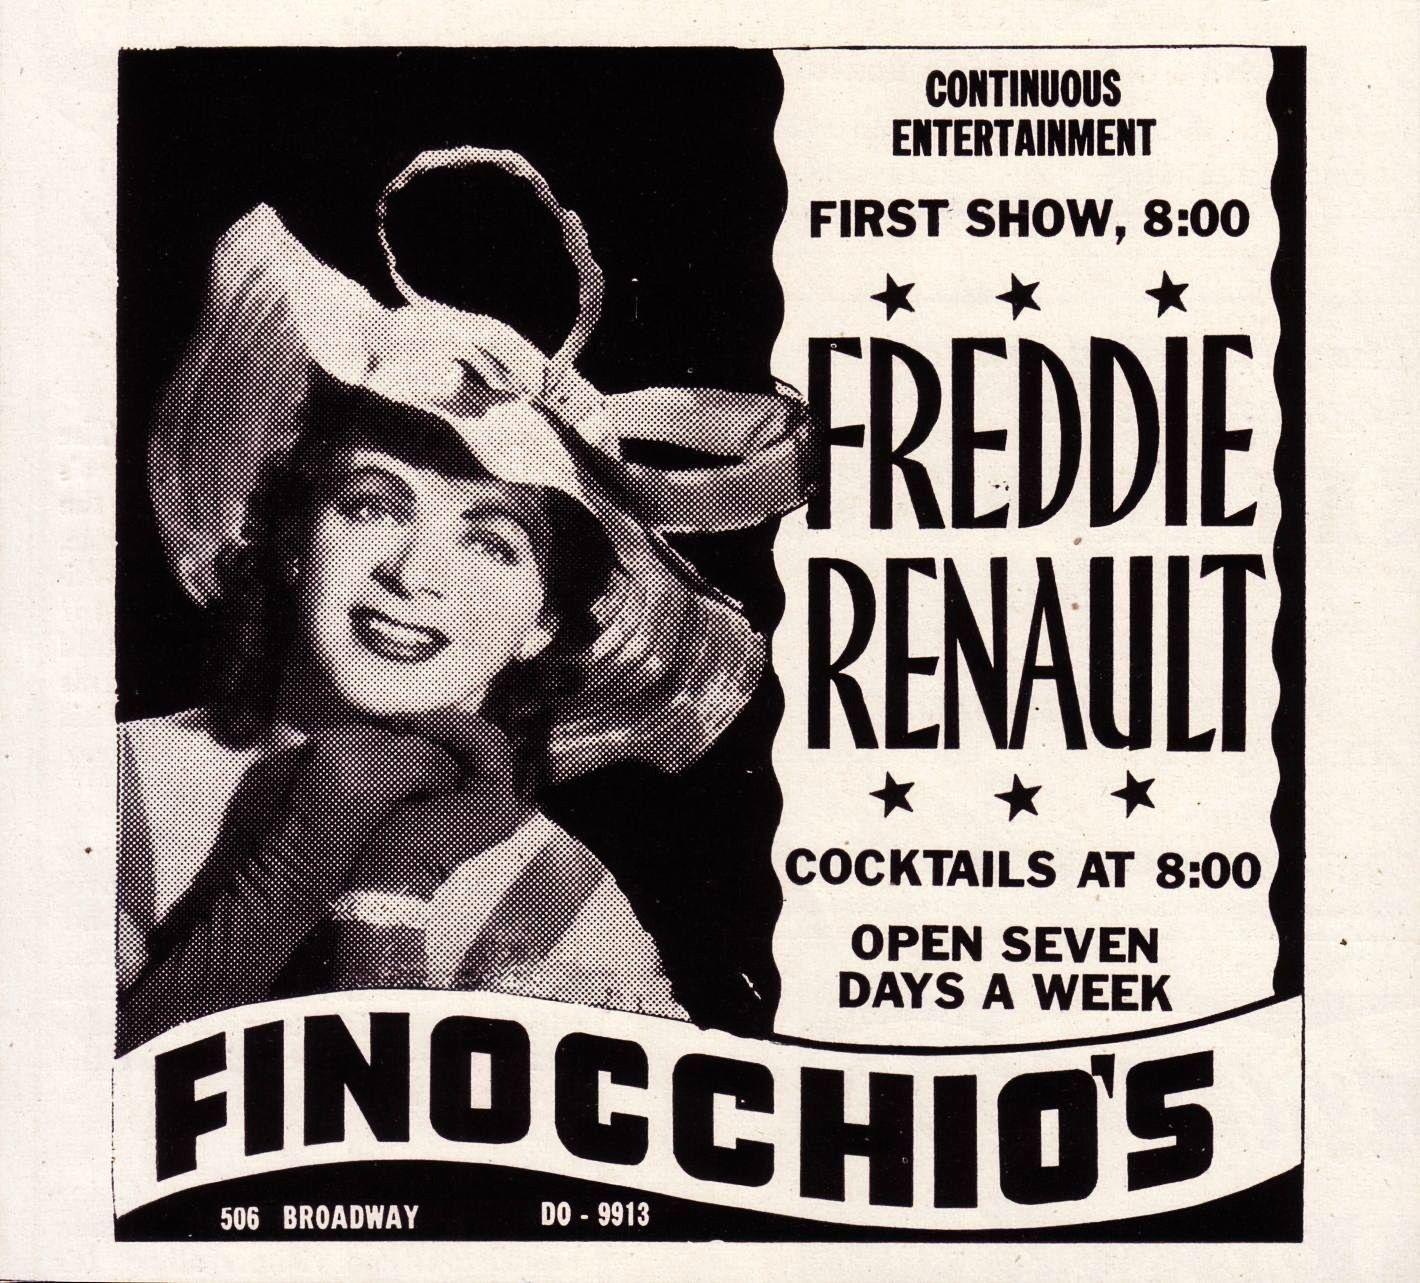 Finocchio's Ad